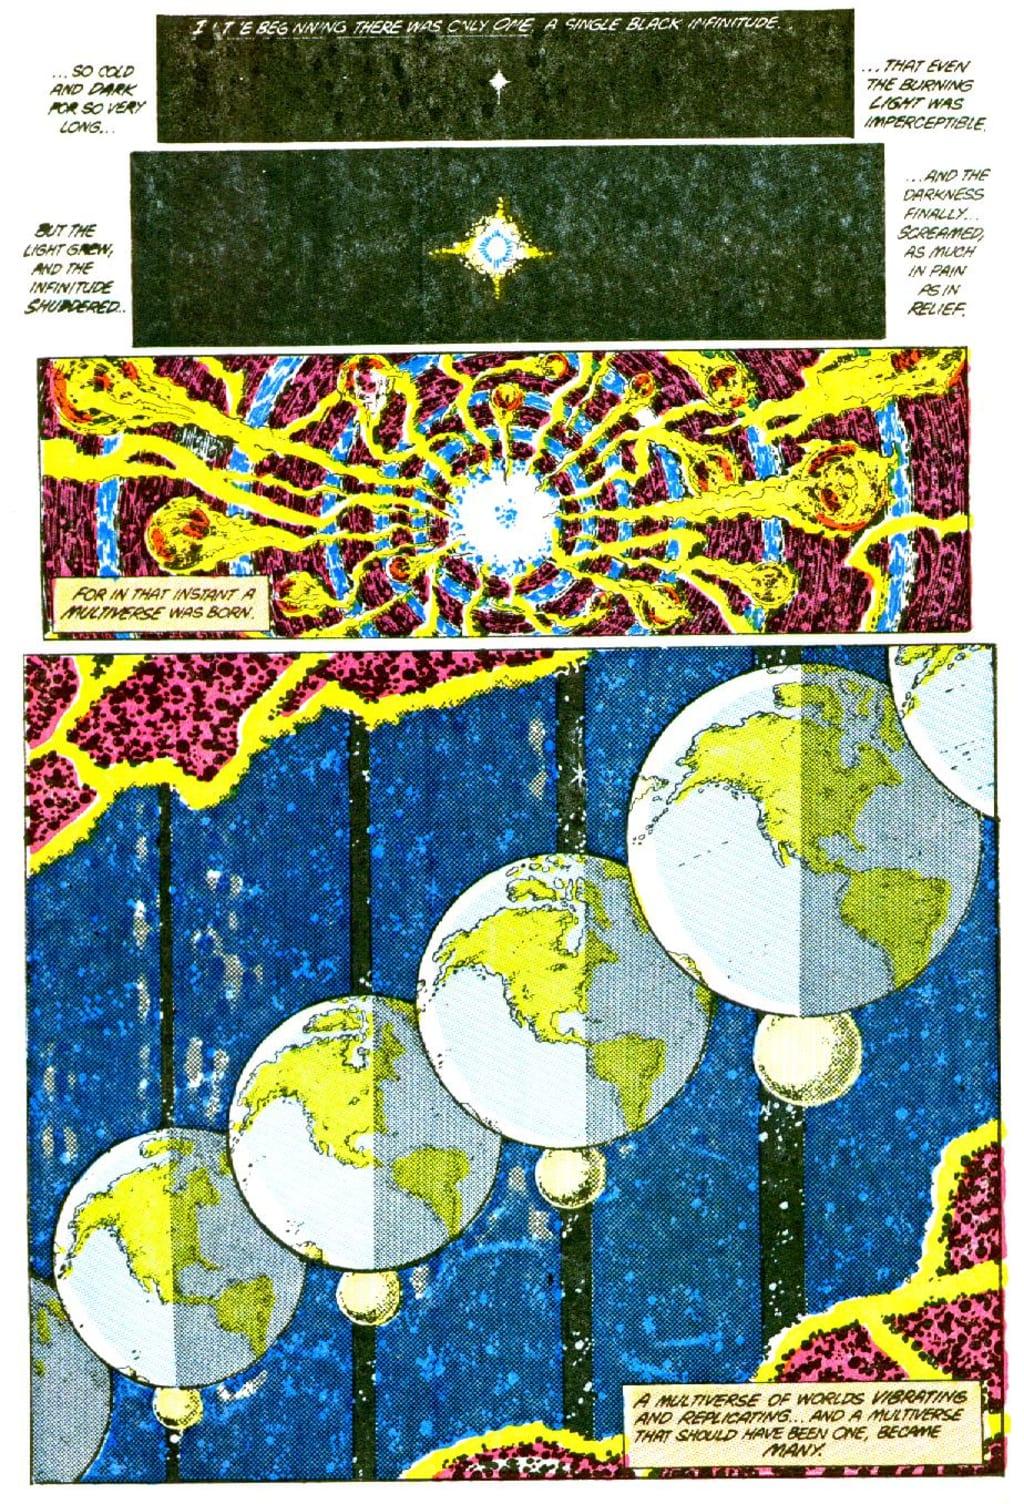 'Crisis on Infinite Earths'